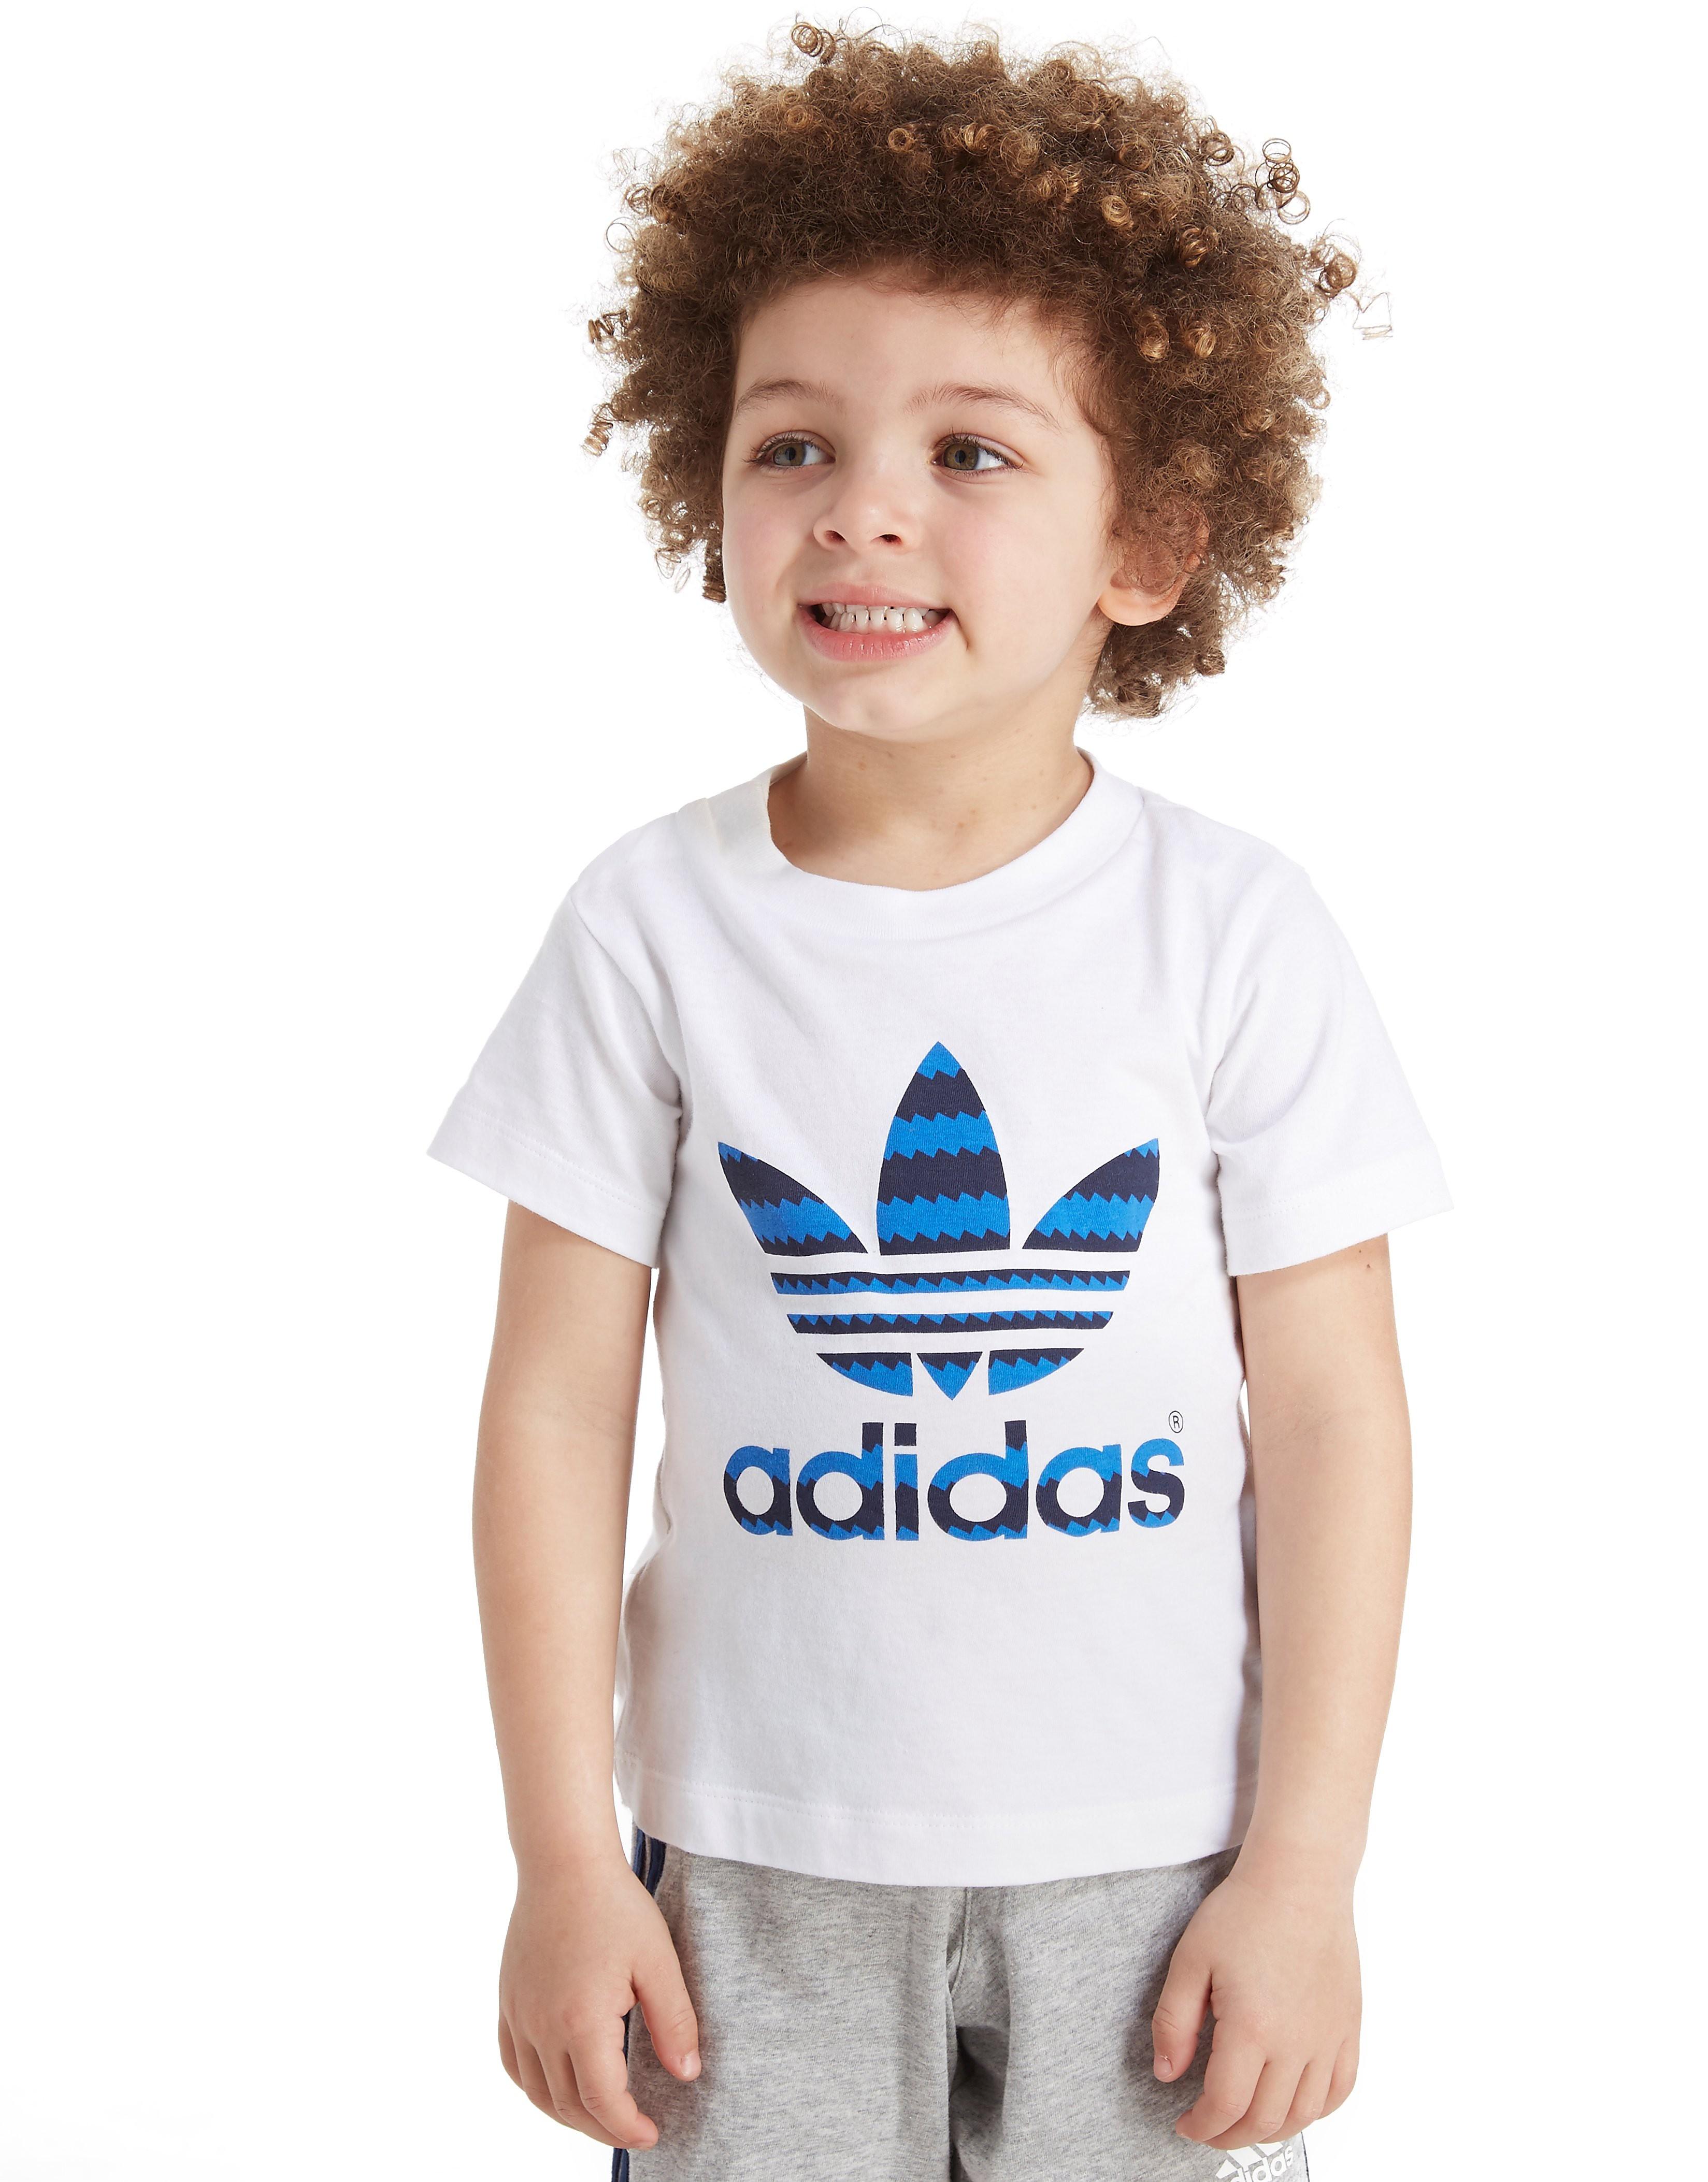 adidas Originals Infil Striped T-Shirt Infant